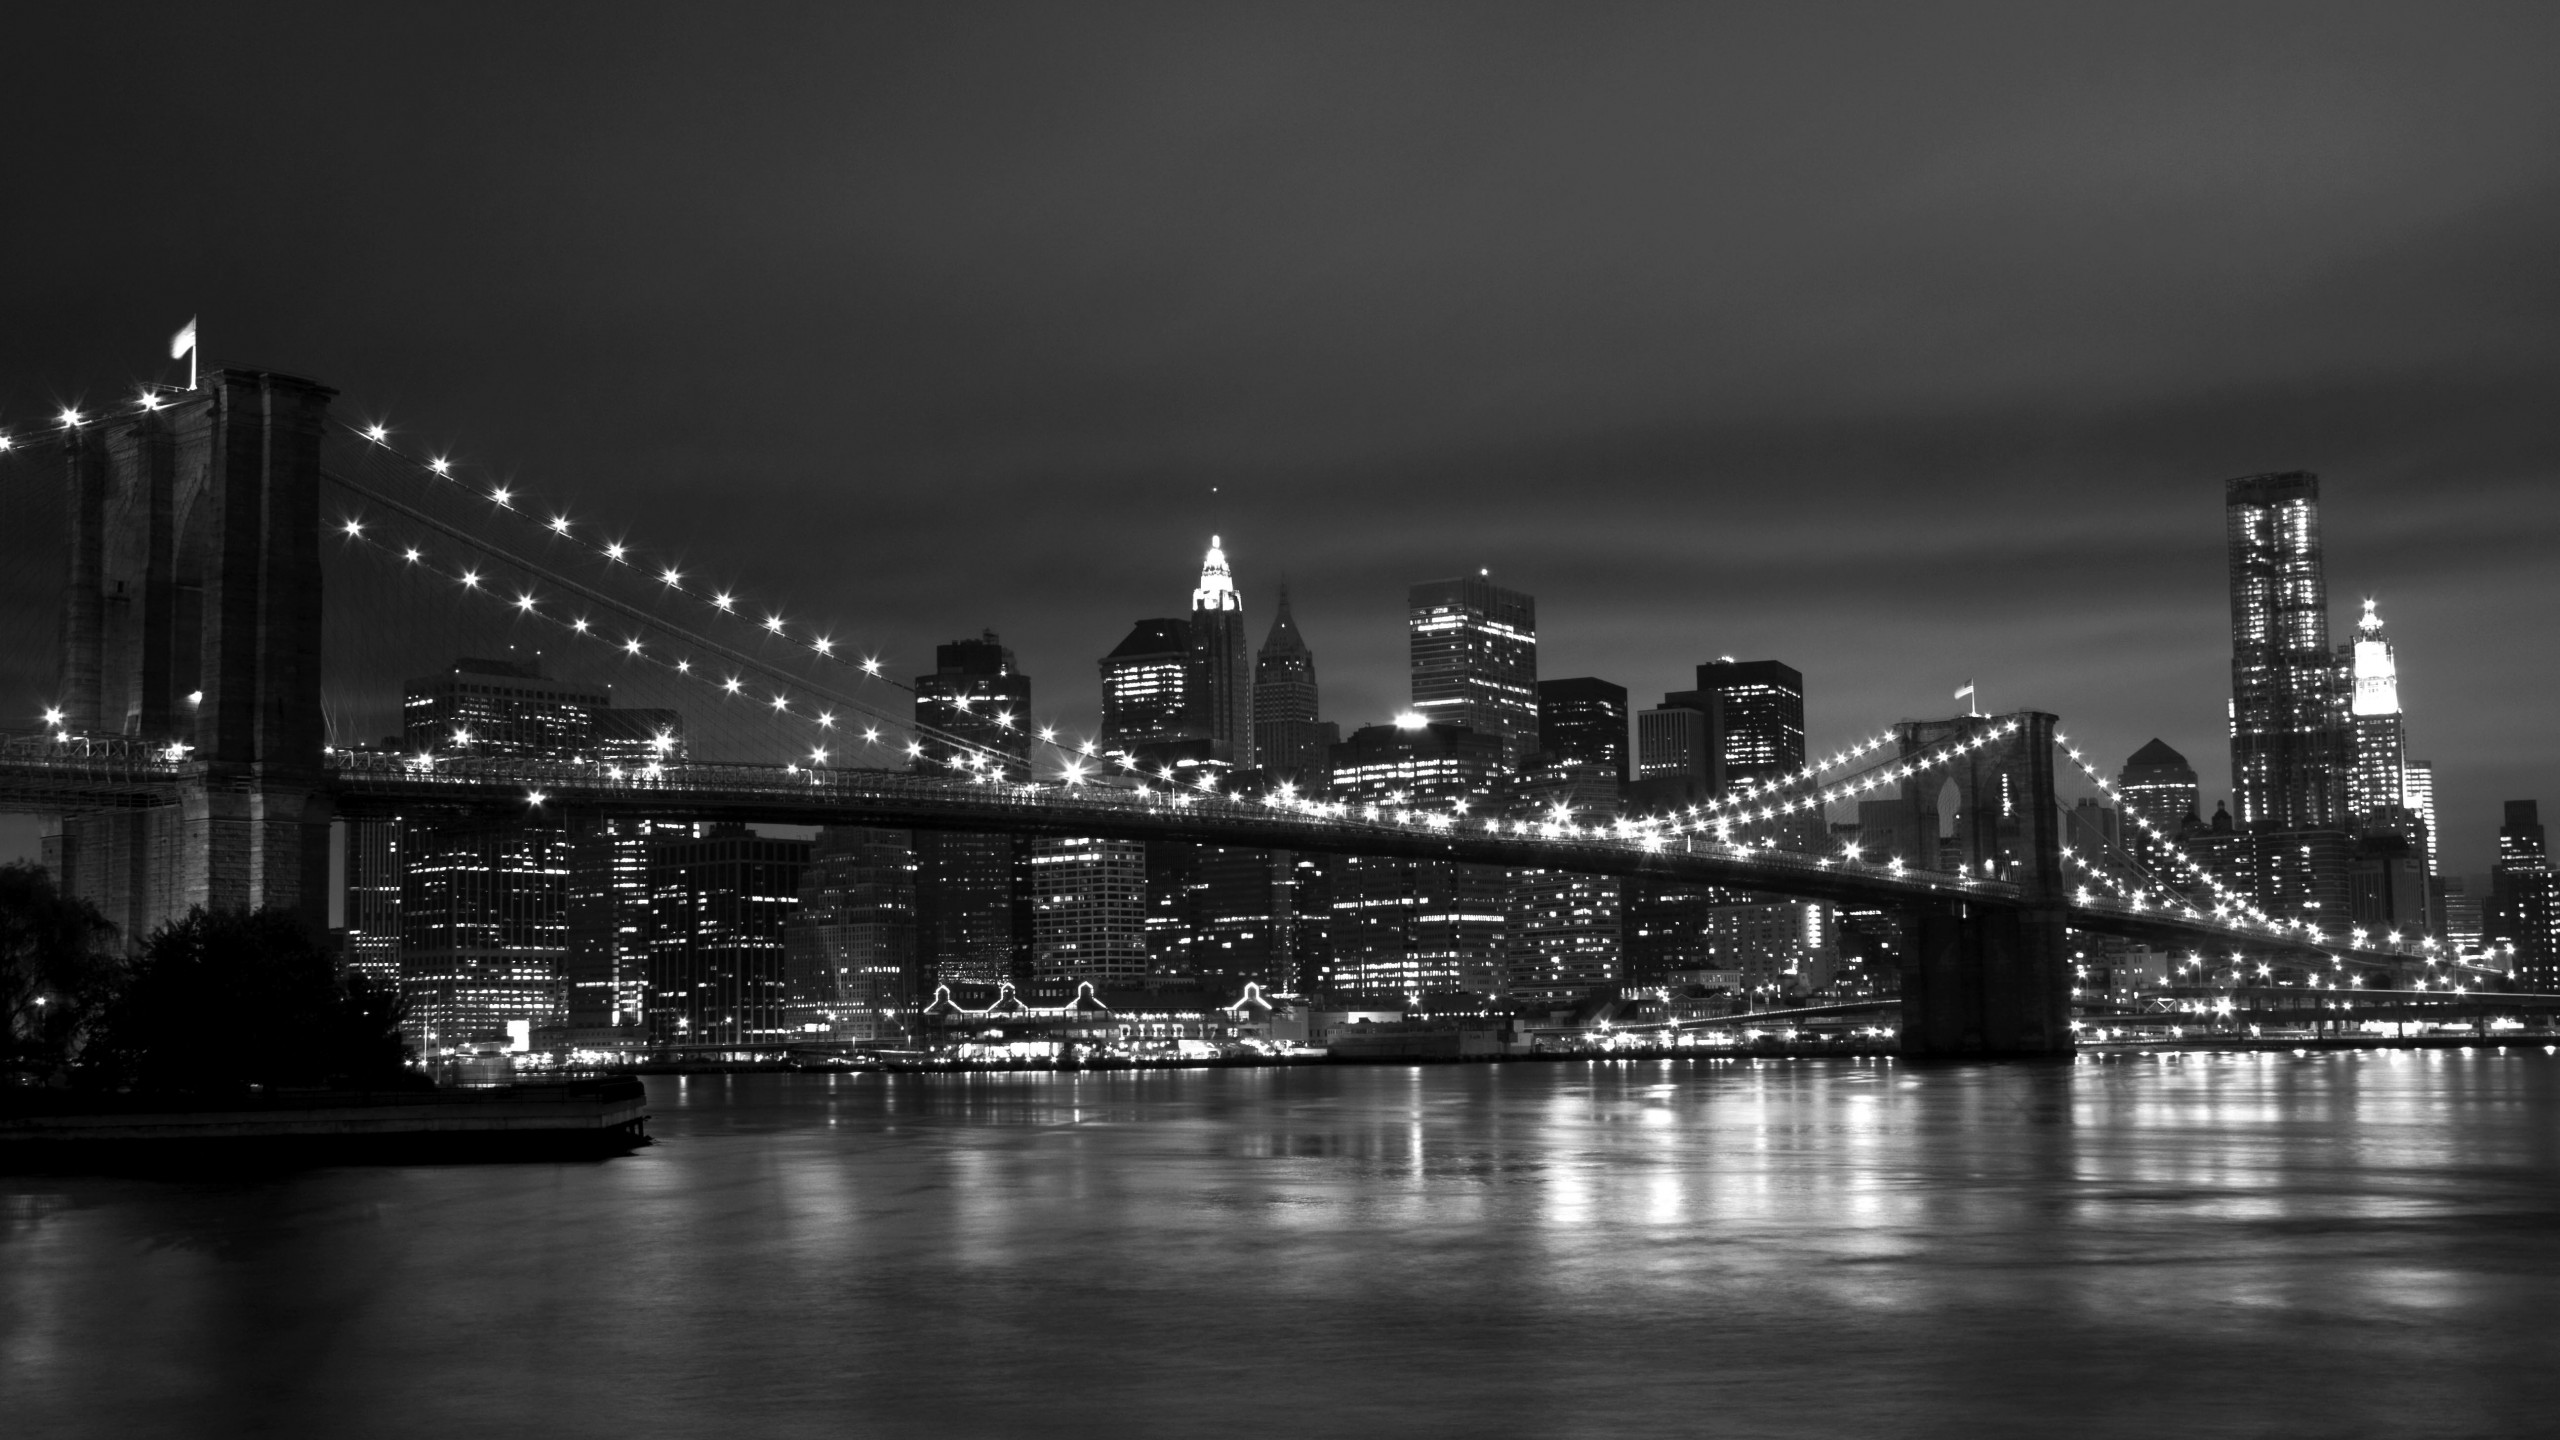 New York Skyline Black And White wallpaper   1106189 2560x1440